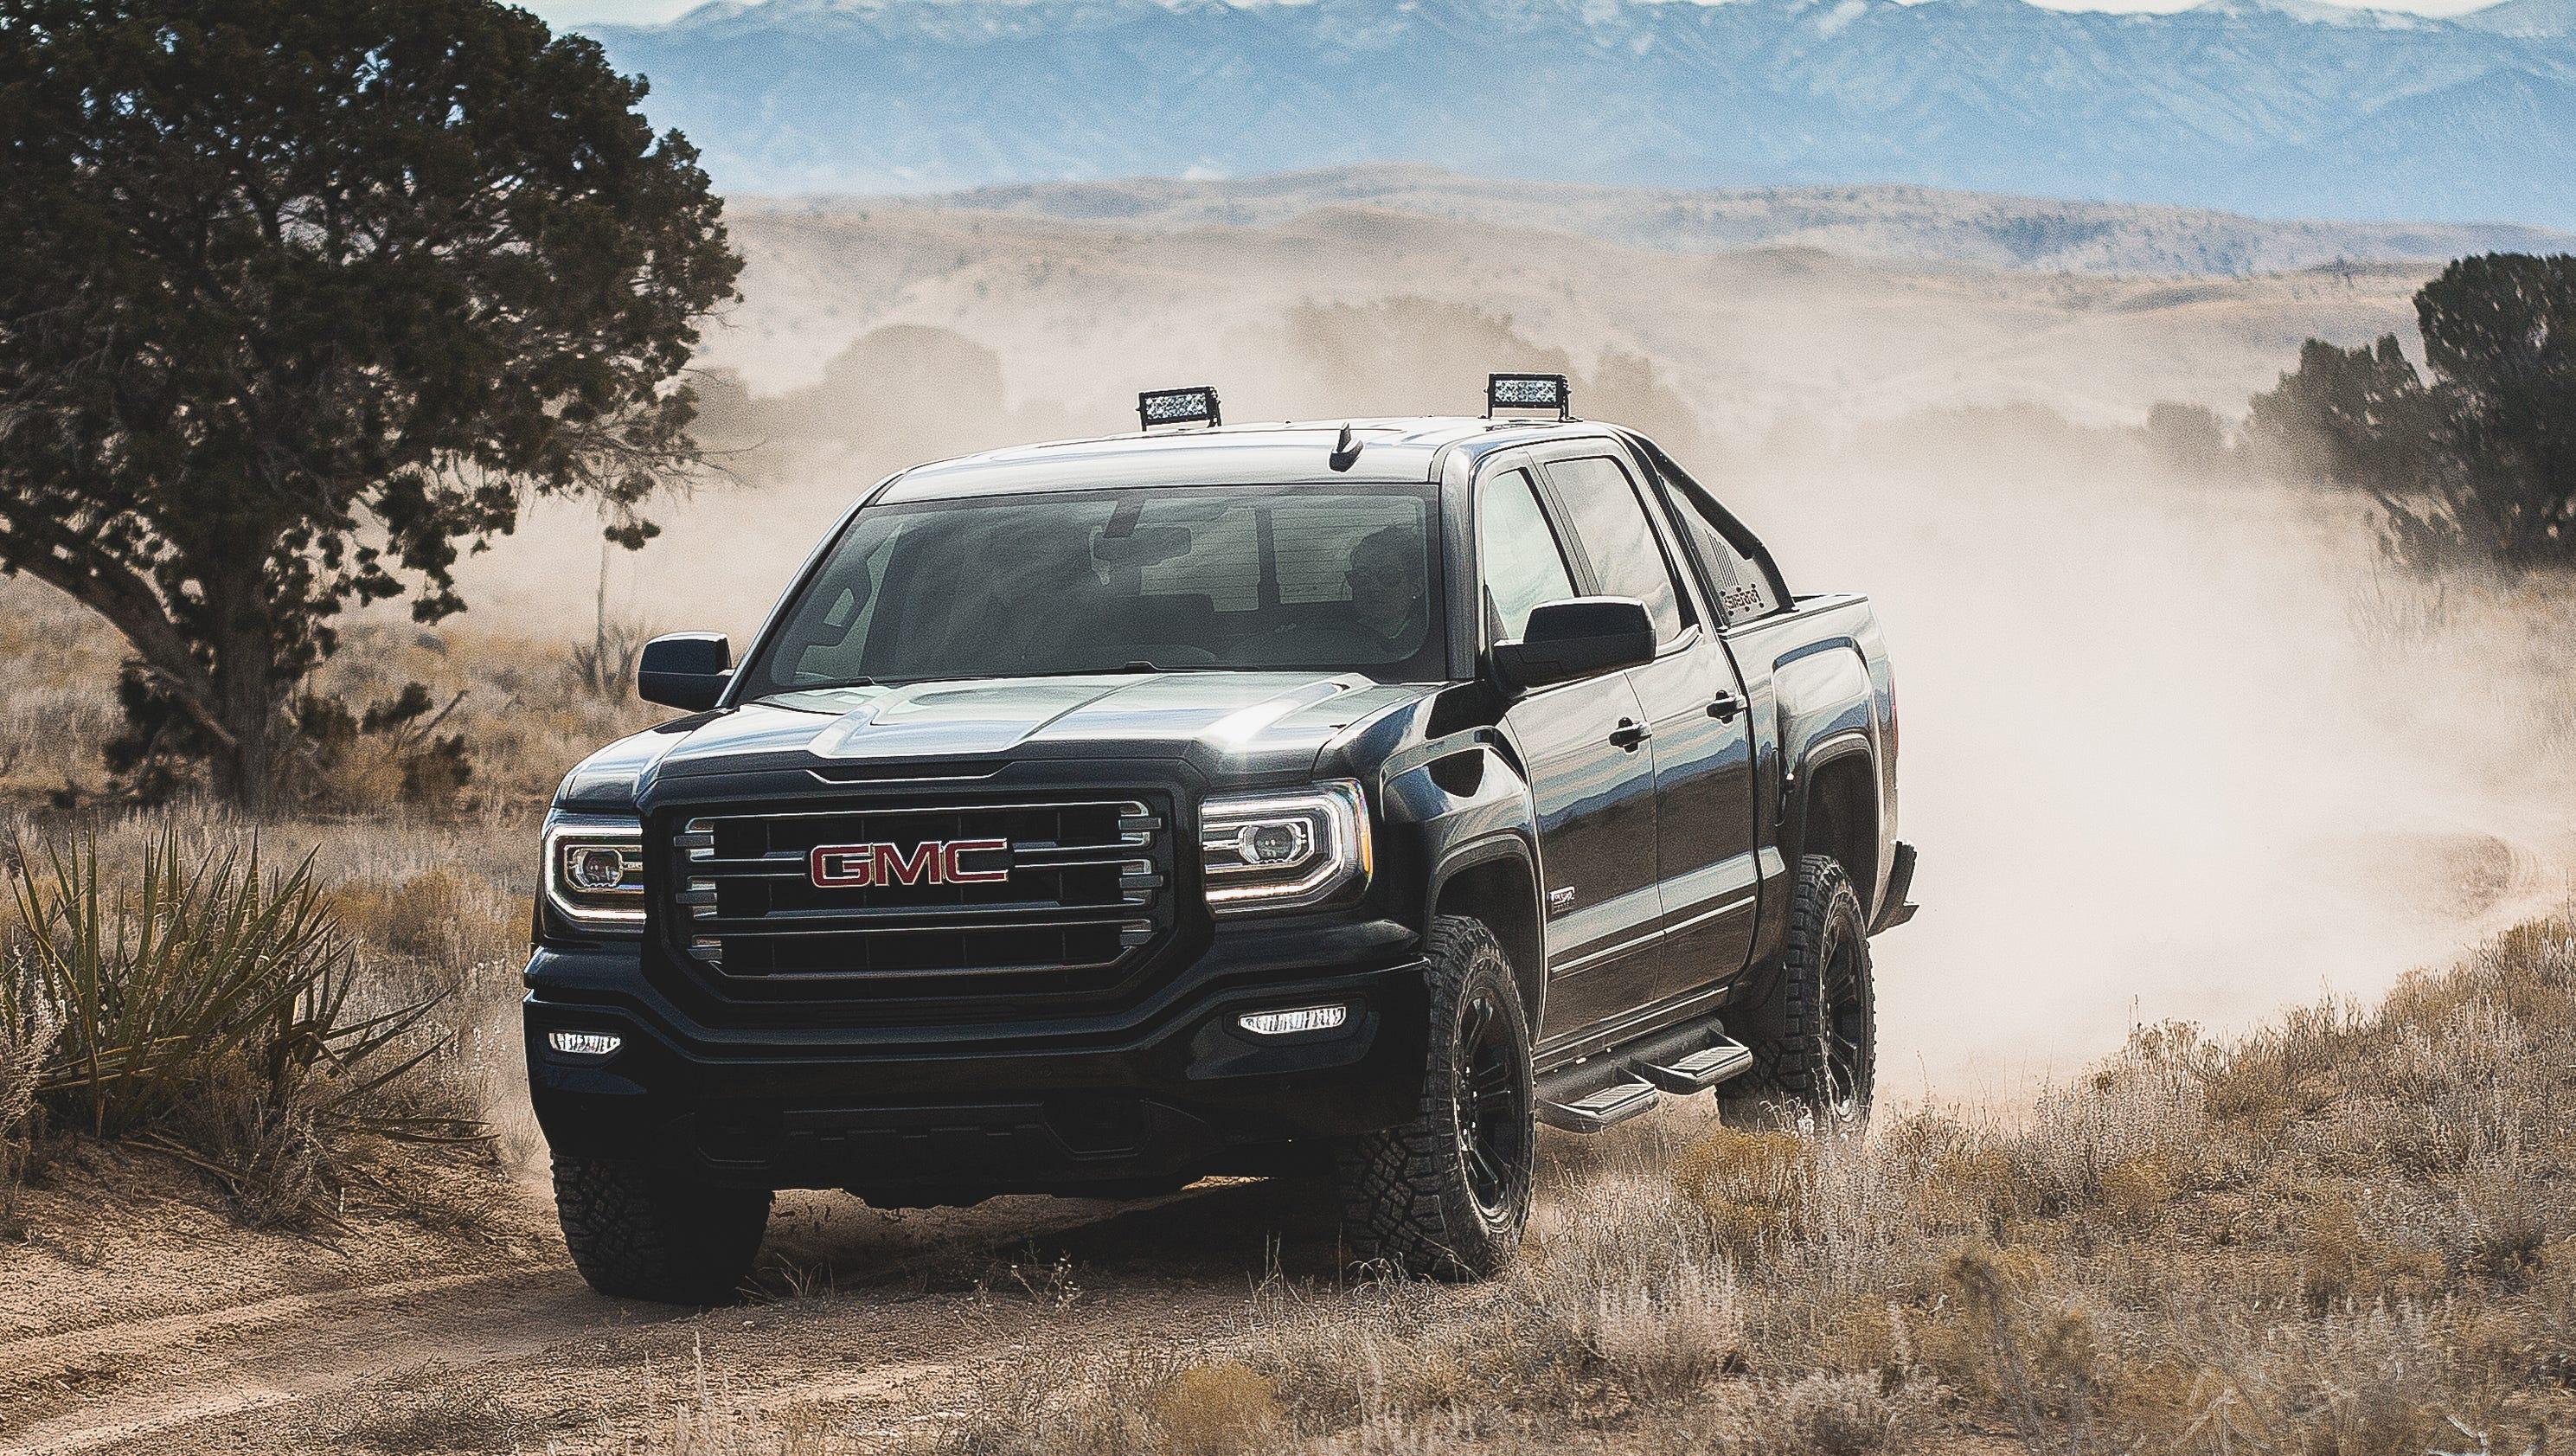 gmc all trucks r new sierra terrain hd day truck comments